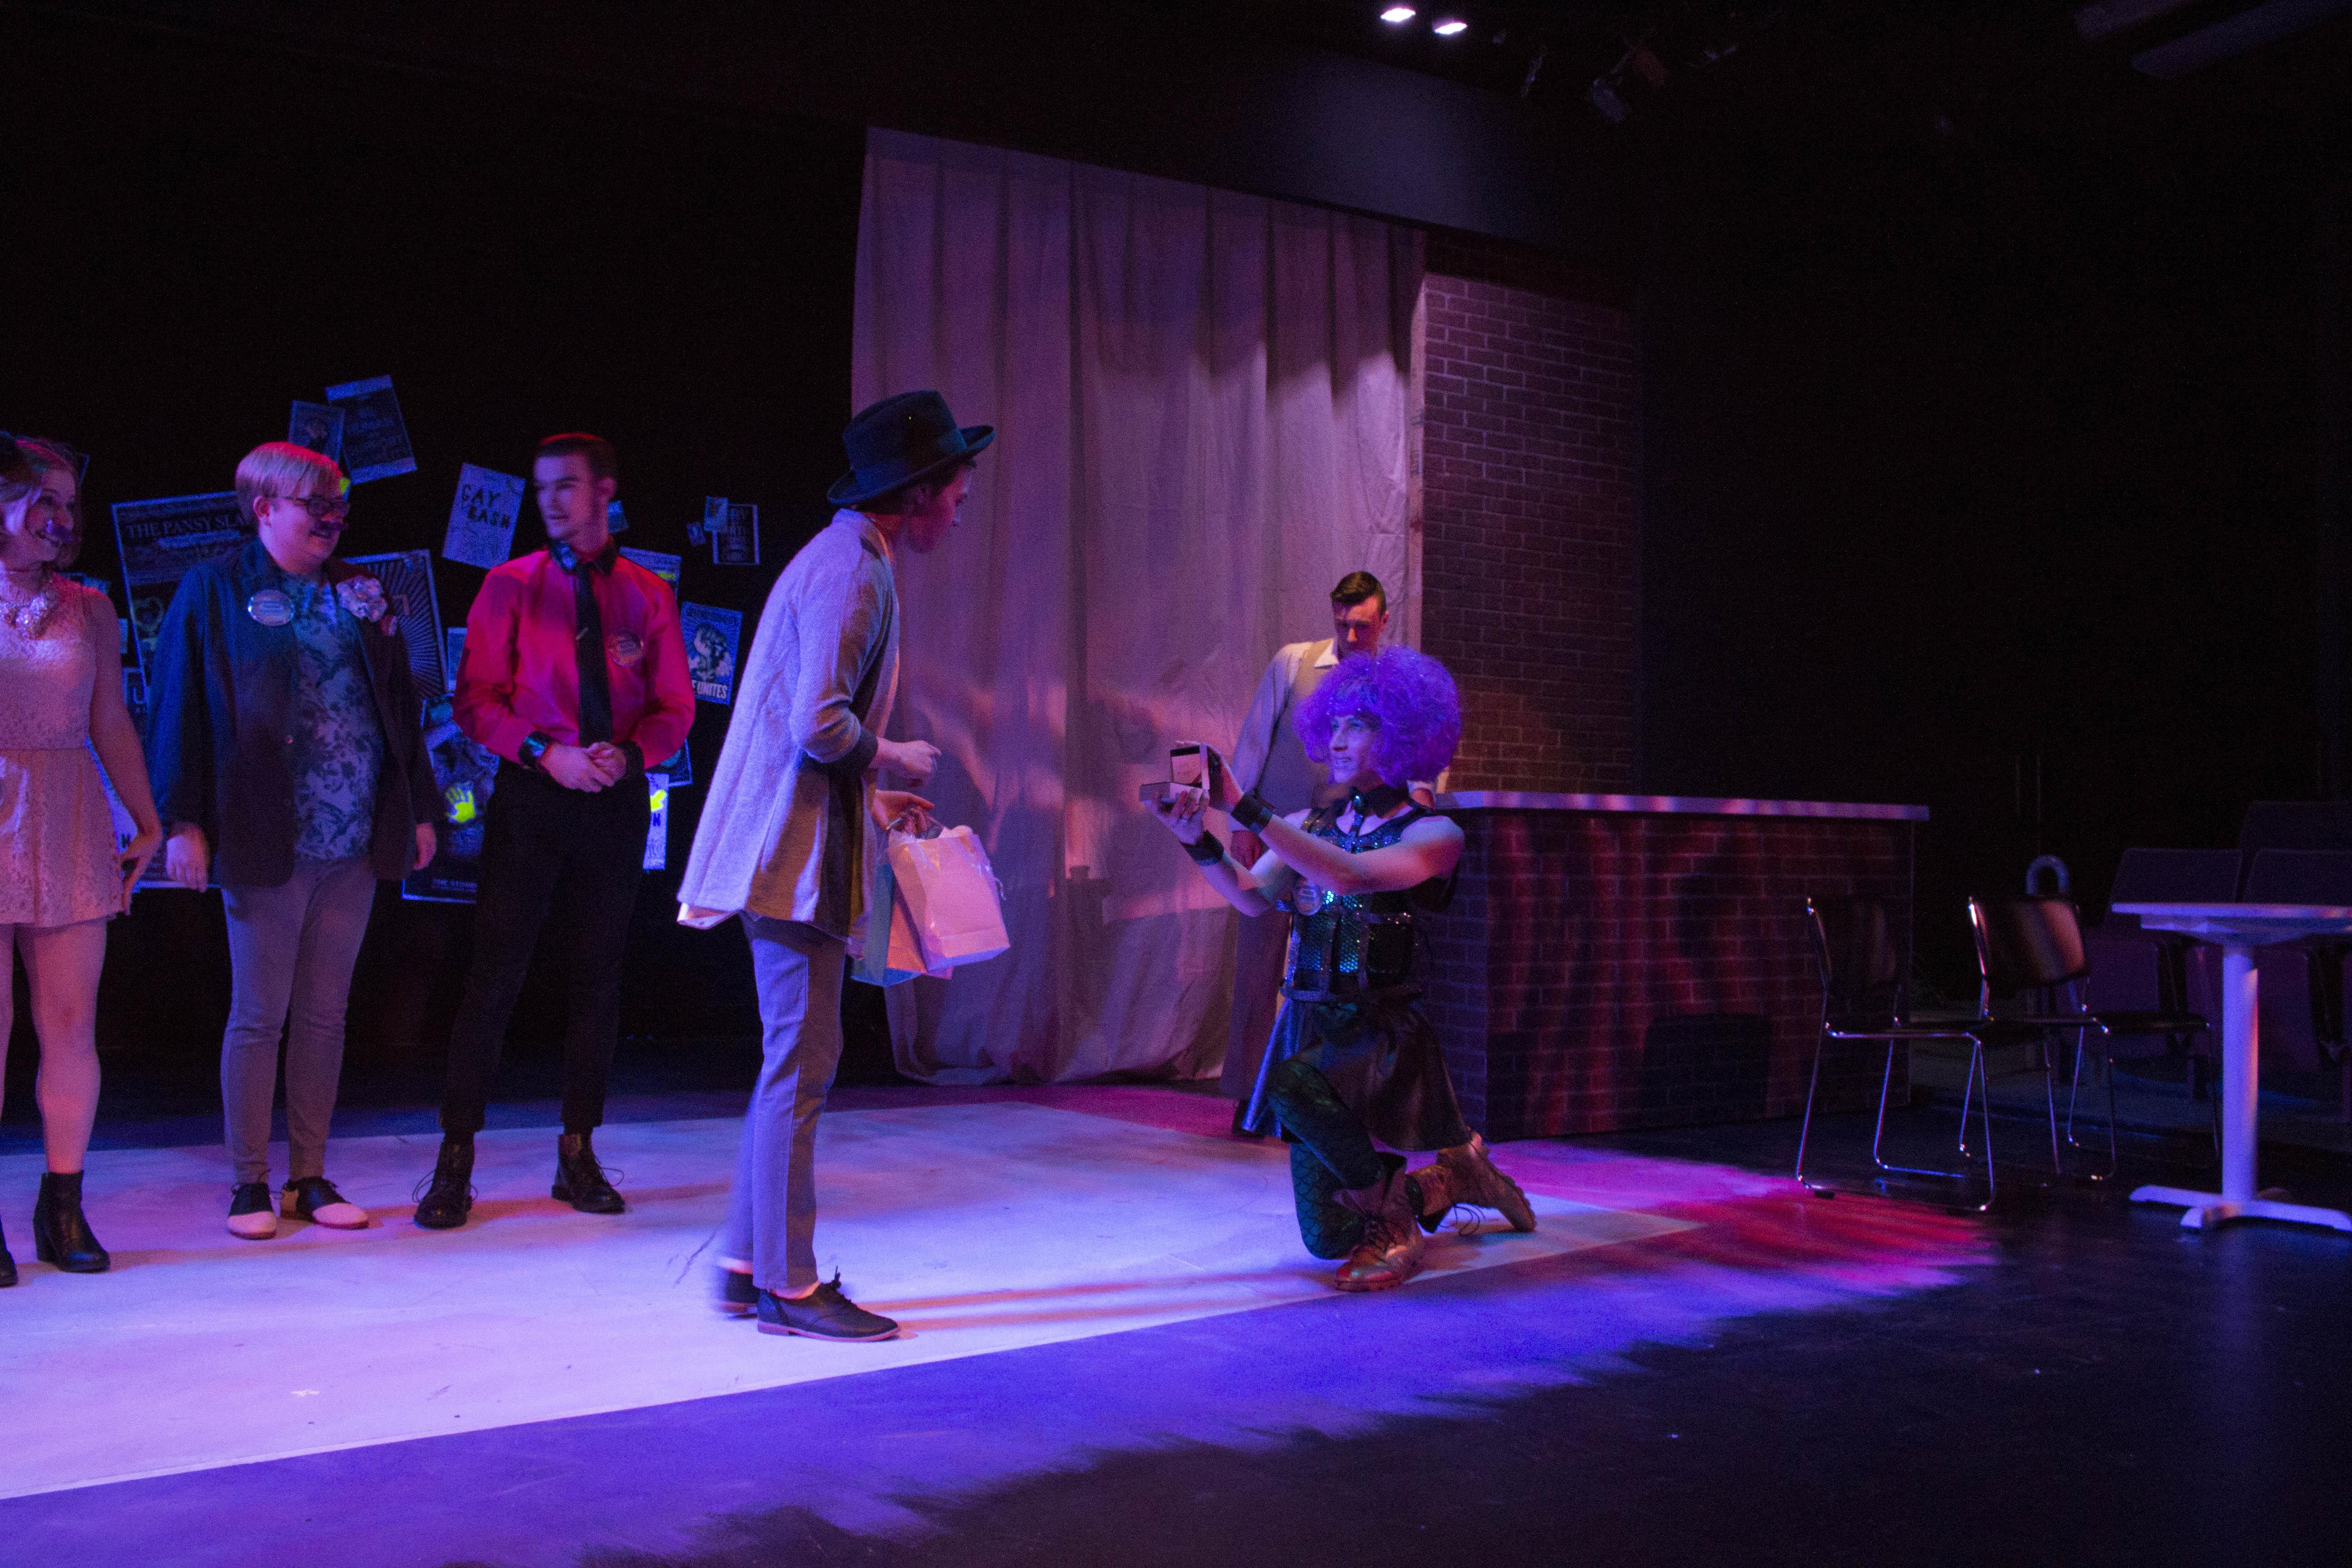 Act 2 - Teague's gift